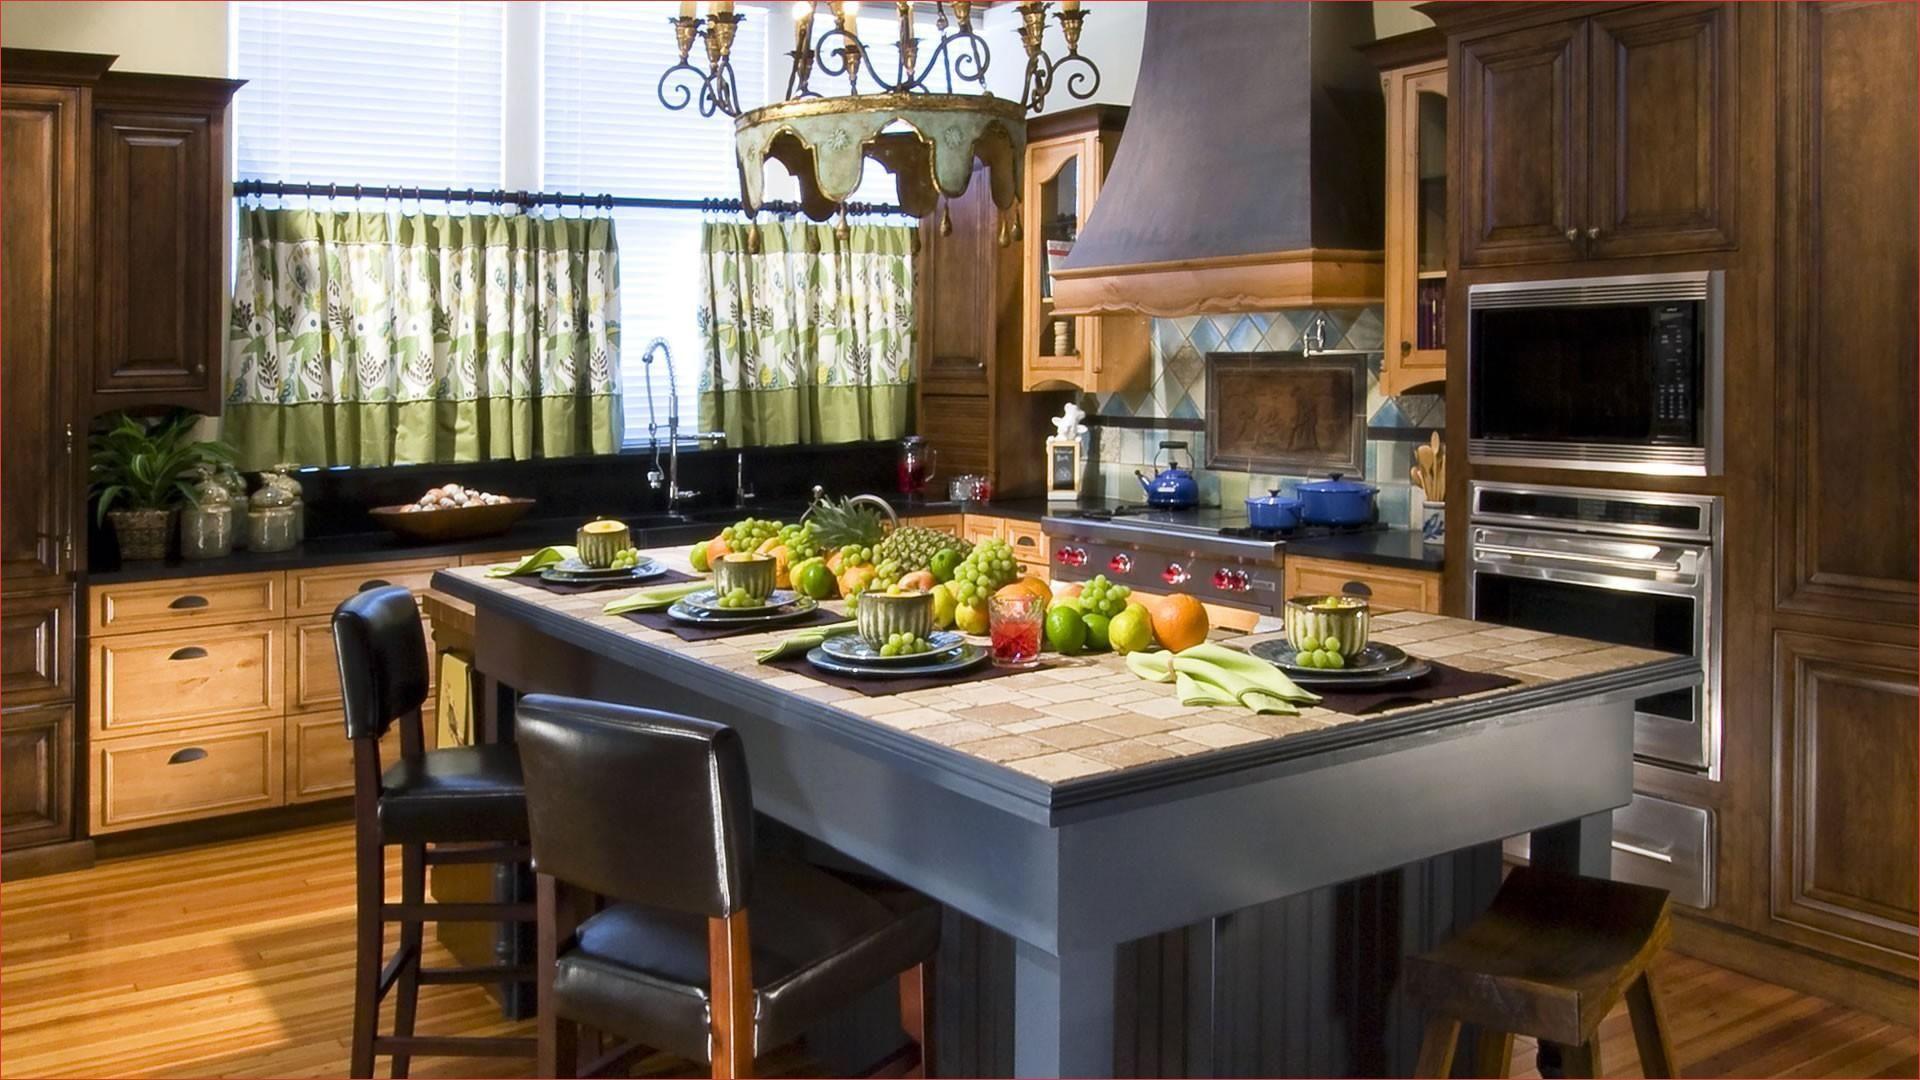 15 colorful boho chic kitchen designs we otomotive info bohemian kitchen decor diy kitchen on boho chic kitchen table decor id=53913